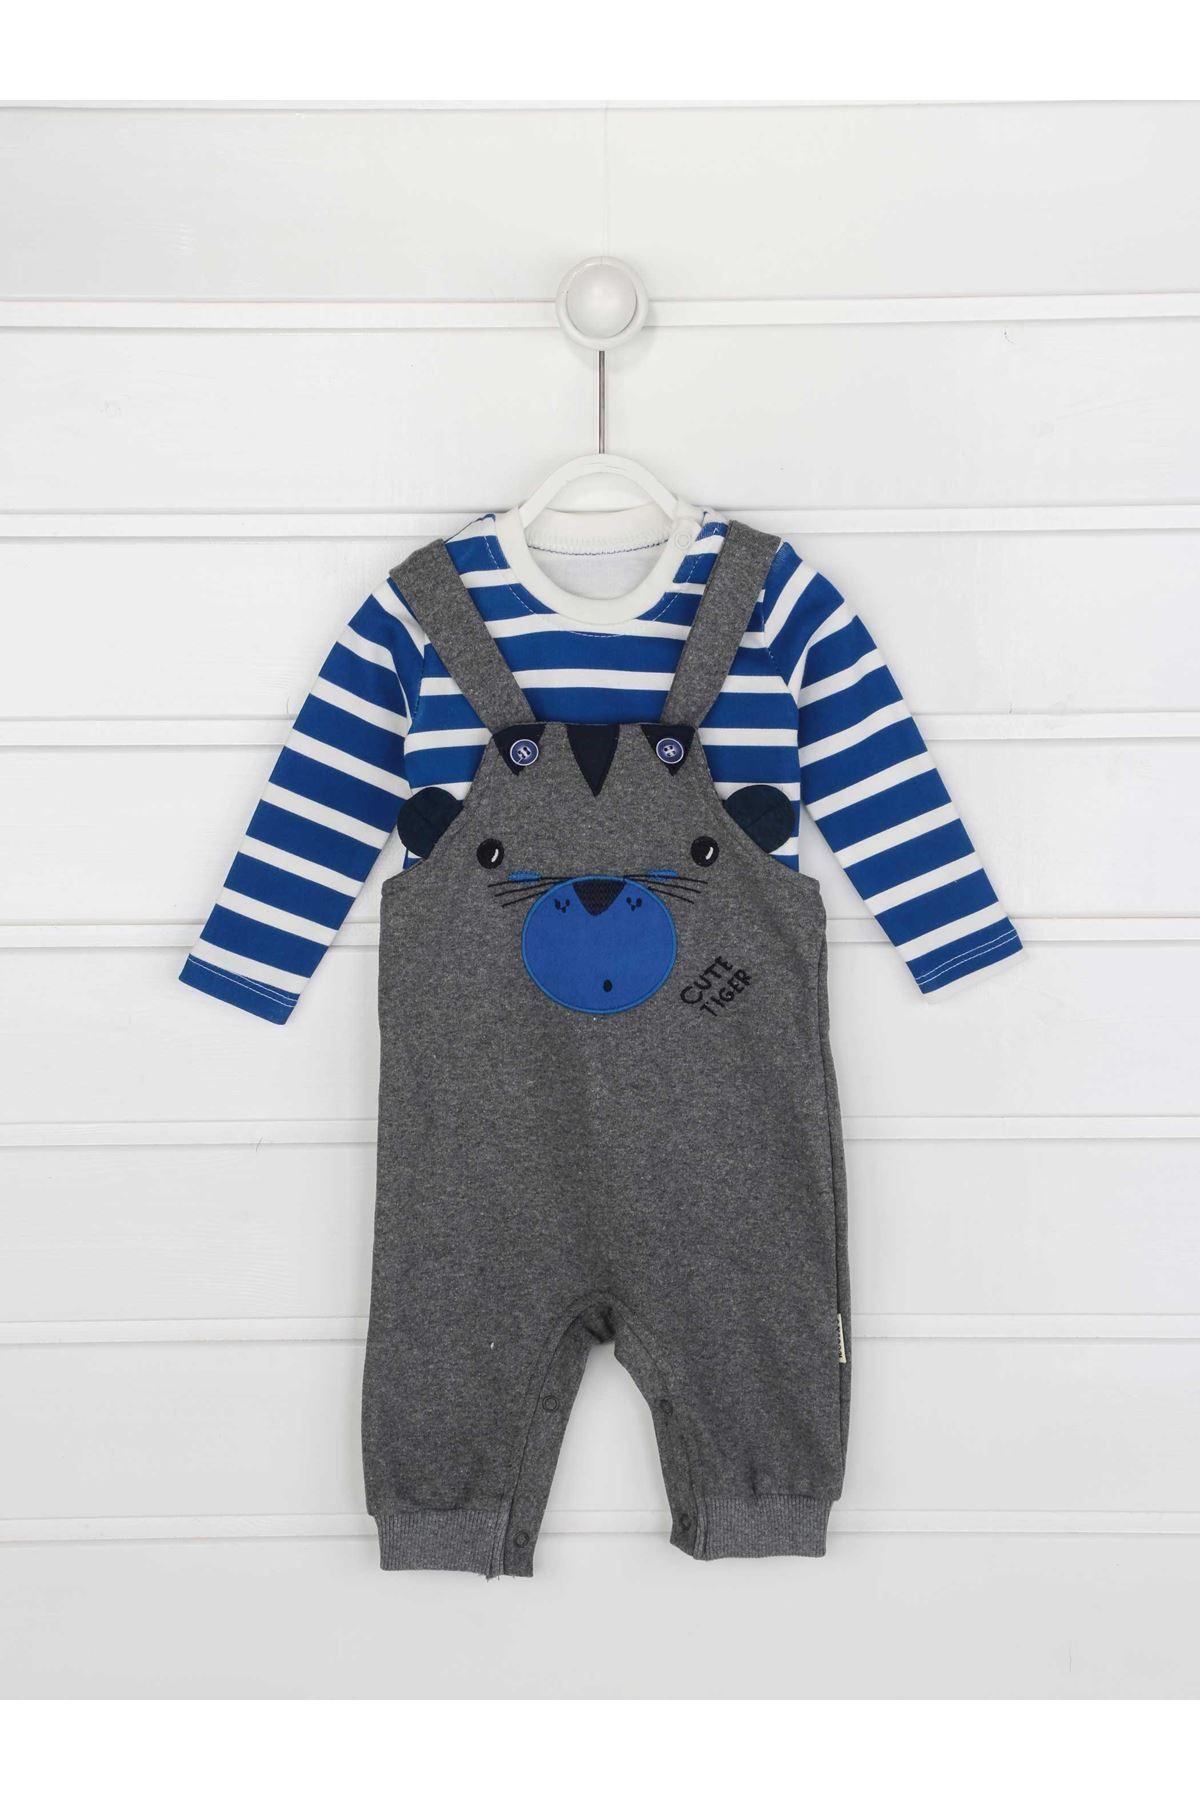 Gray baby boy rompers seasonal salopet style figured daily sweet babies boy models